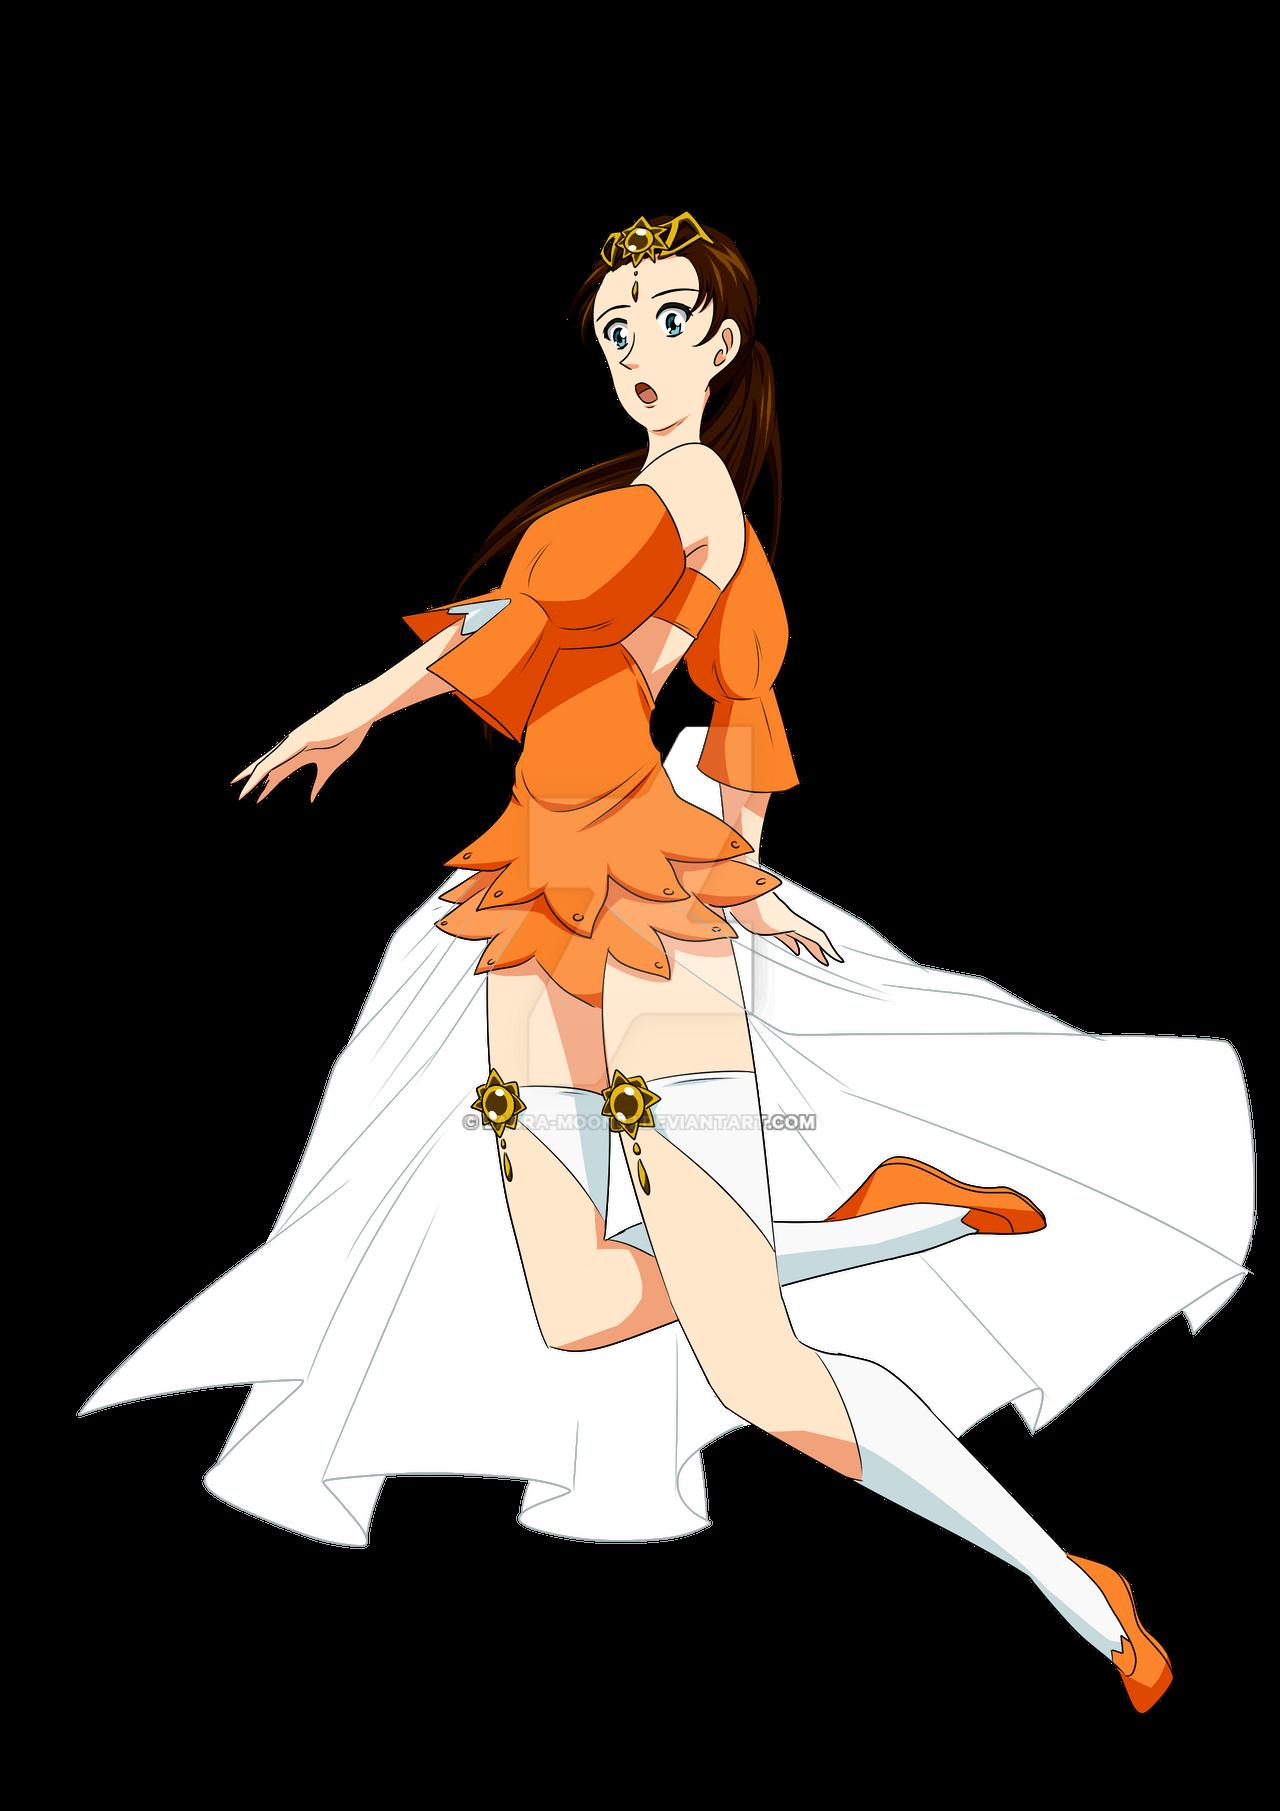 Felicia - Sun costume Uta Kata by Laura-Moon97